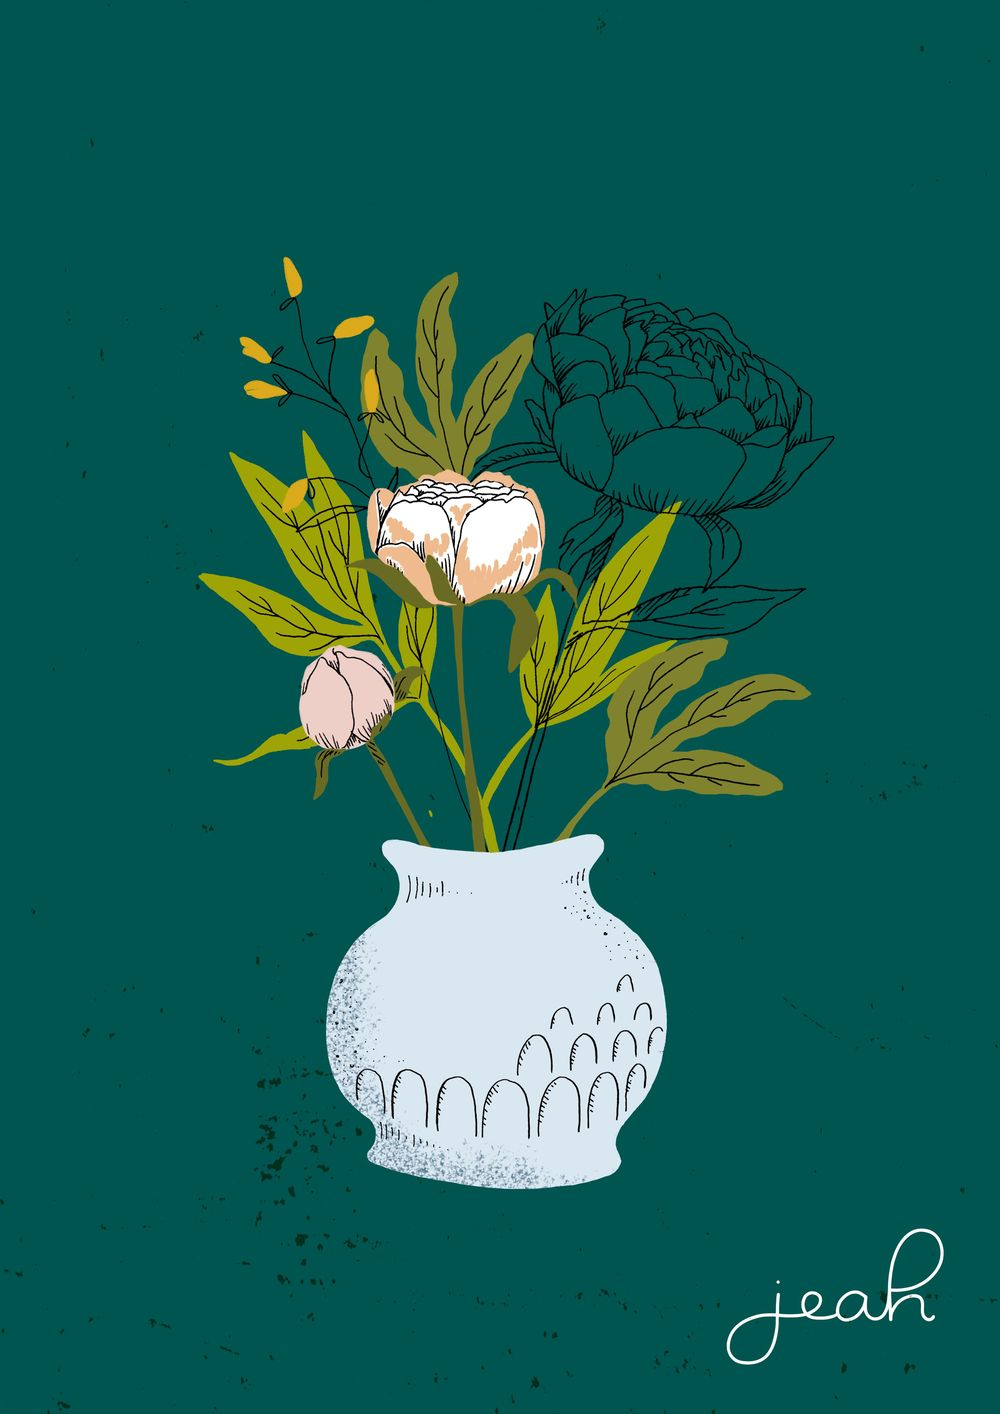 Orion bouquet - image 3 - student project